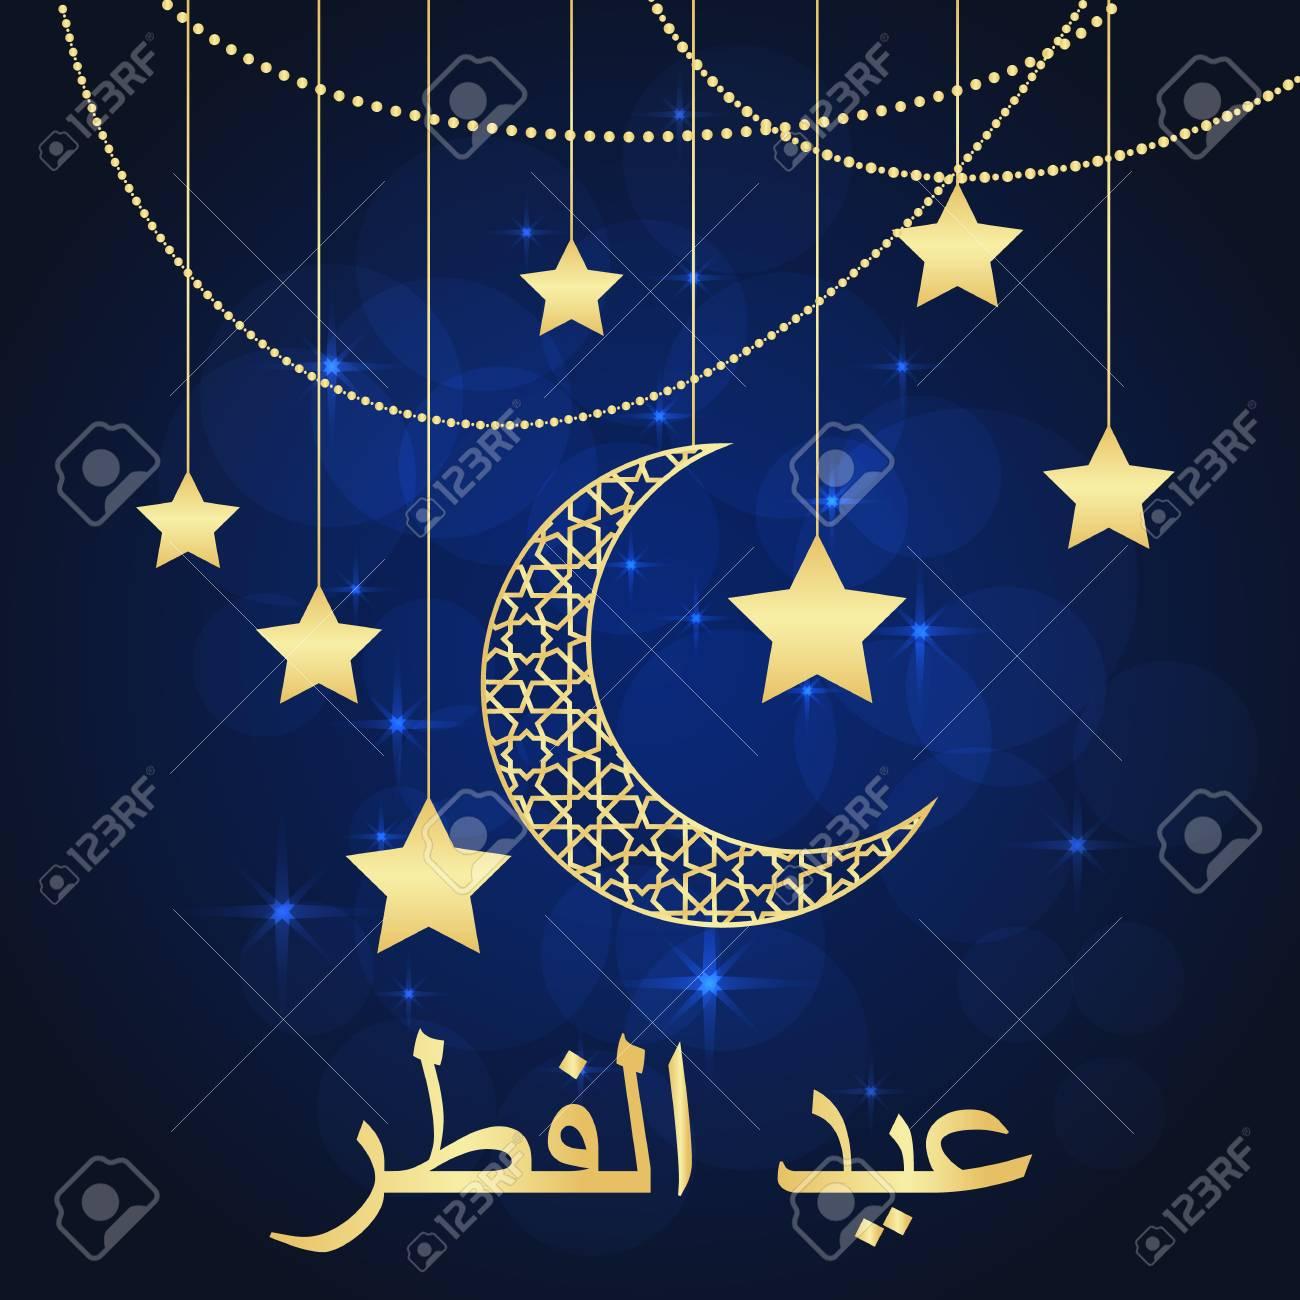 Best Different Eid Al-Fitr Greeting - 58667541-eid-al-fitr-greeting-card-on-blue-background-vector-illustration-eid-al-fitr-means-festival-of-break  You Should Have_193253 .jpg